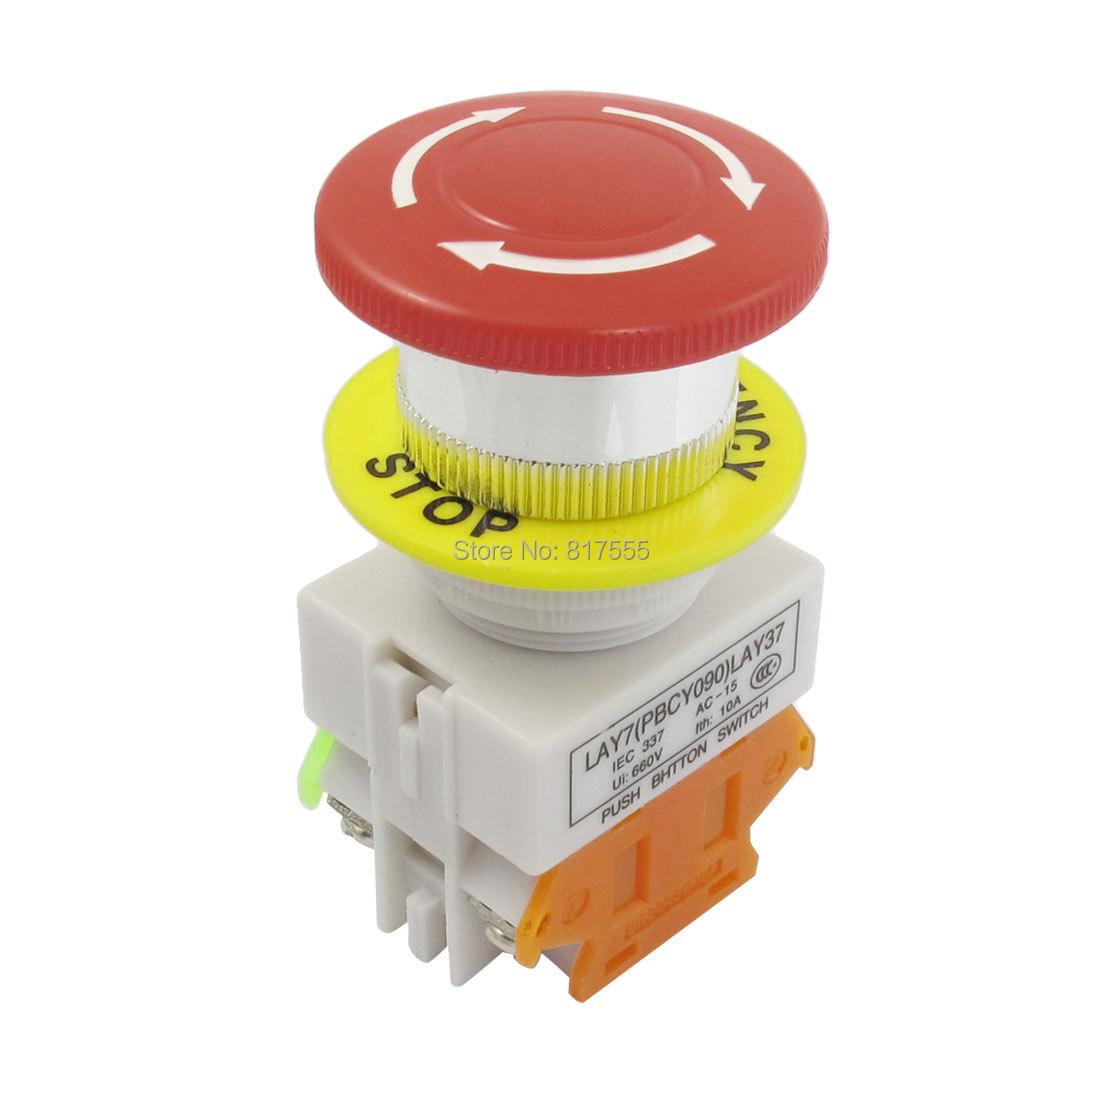 Red Mushroom Cap 1NO 1NC Emergency Stop Push Button Switch AC 660V 10A Ioxcz Diameter(China (Mainland))